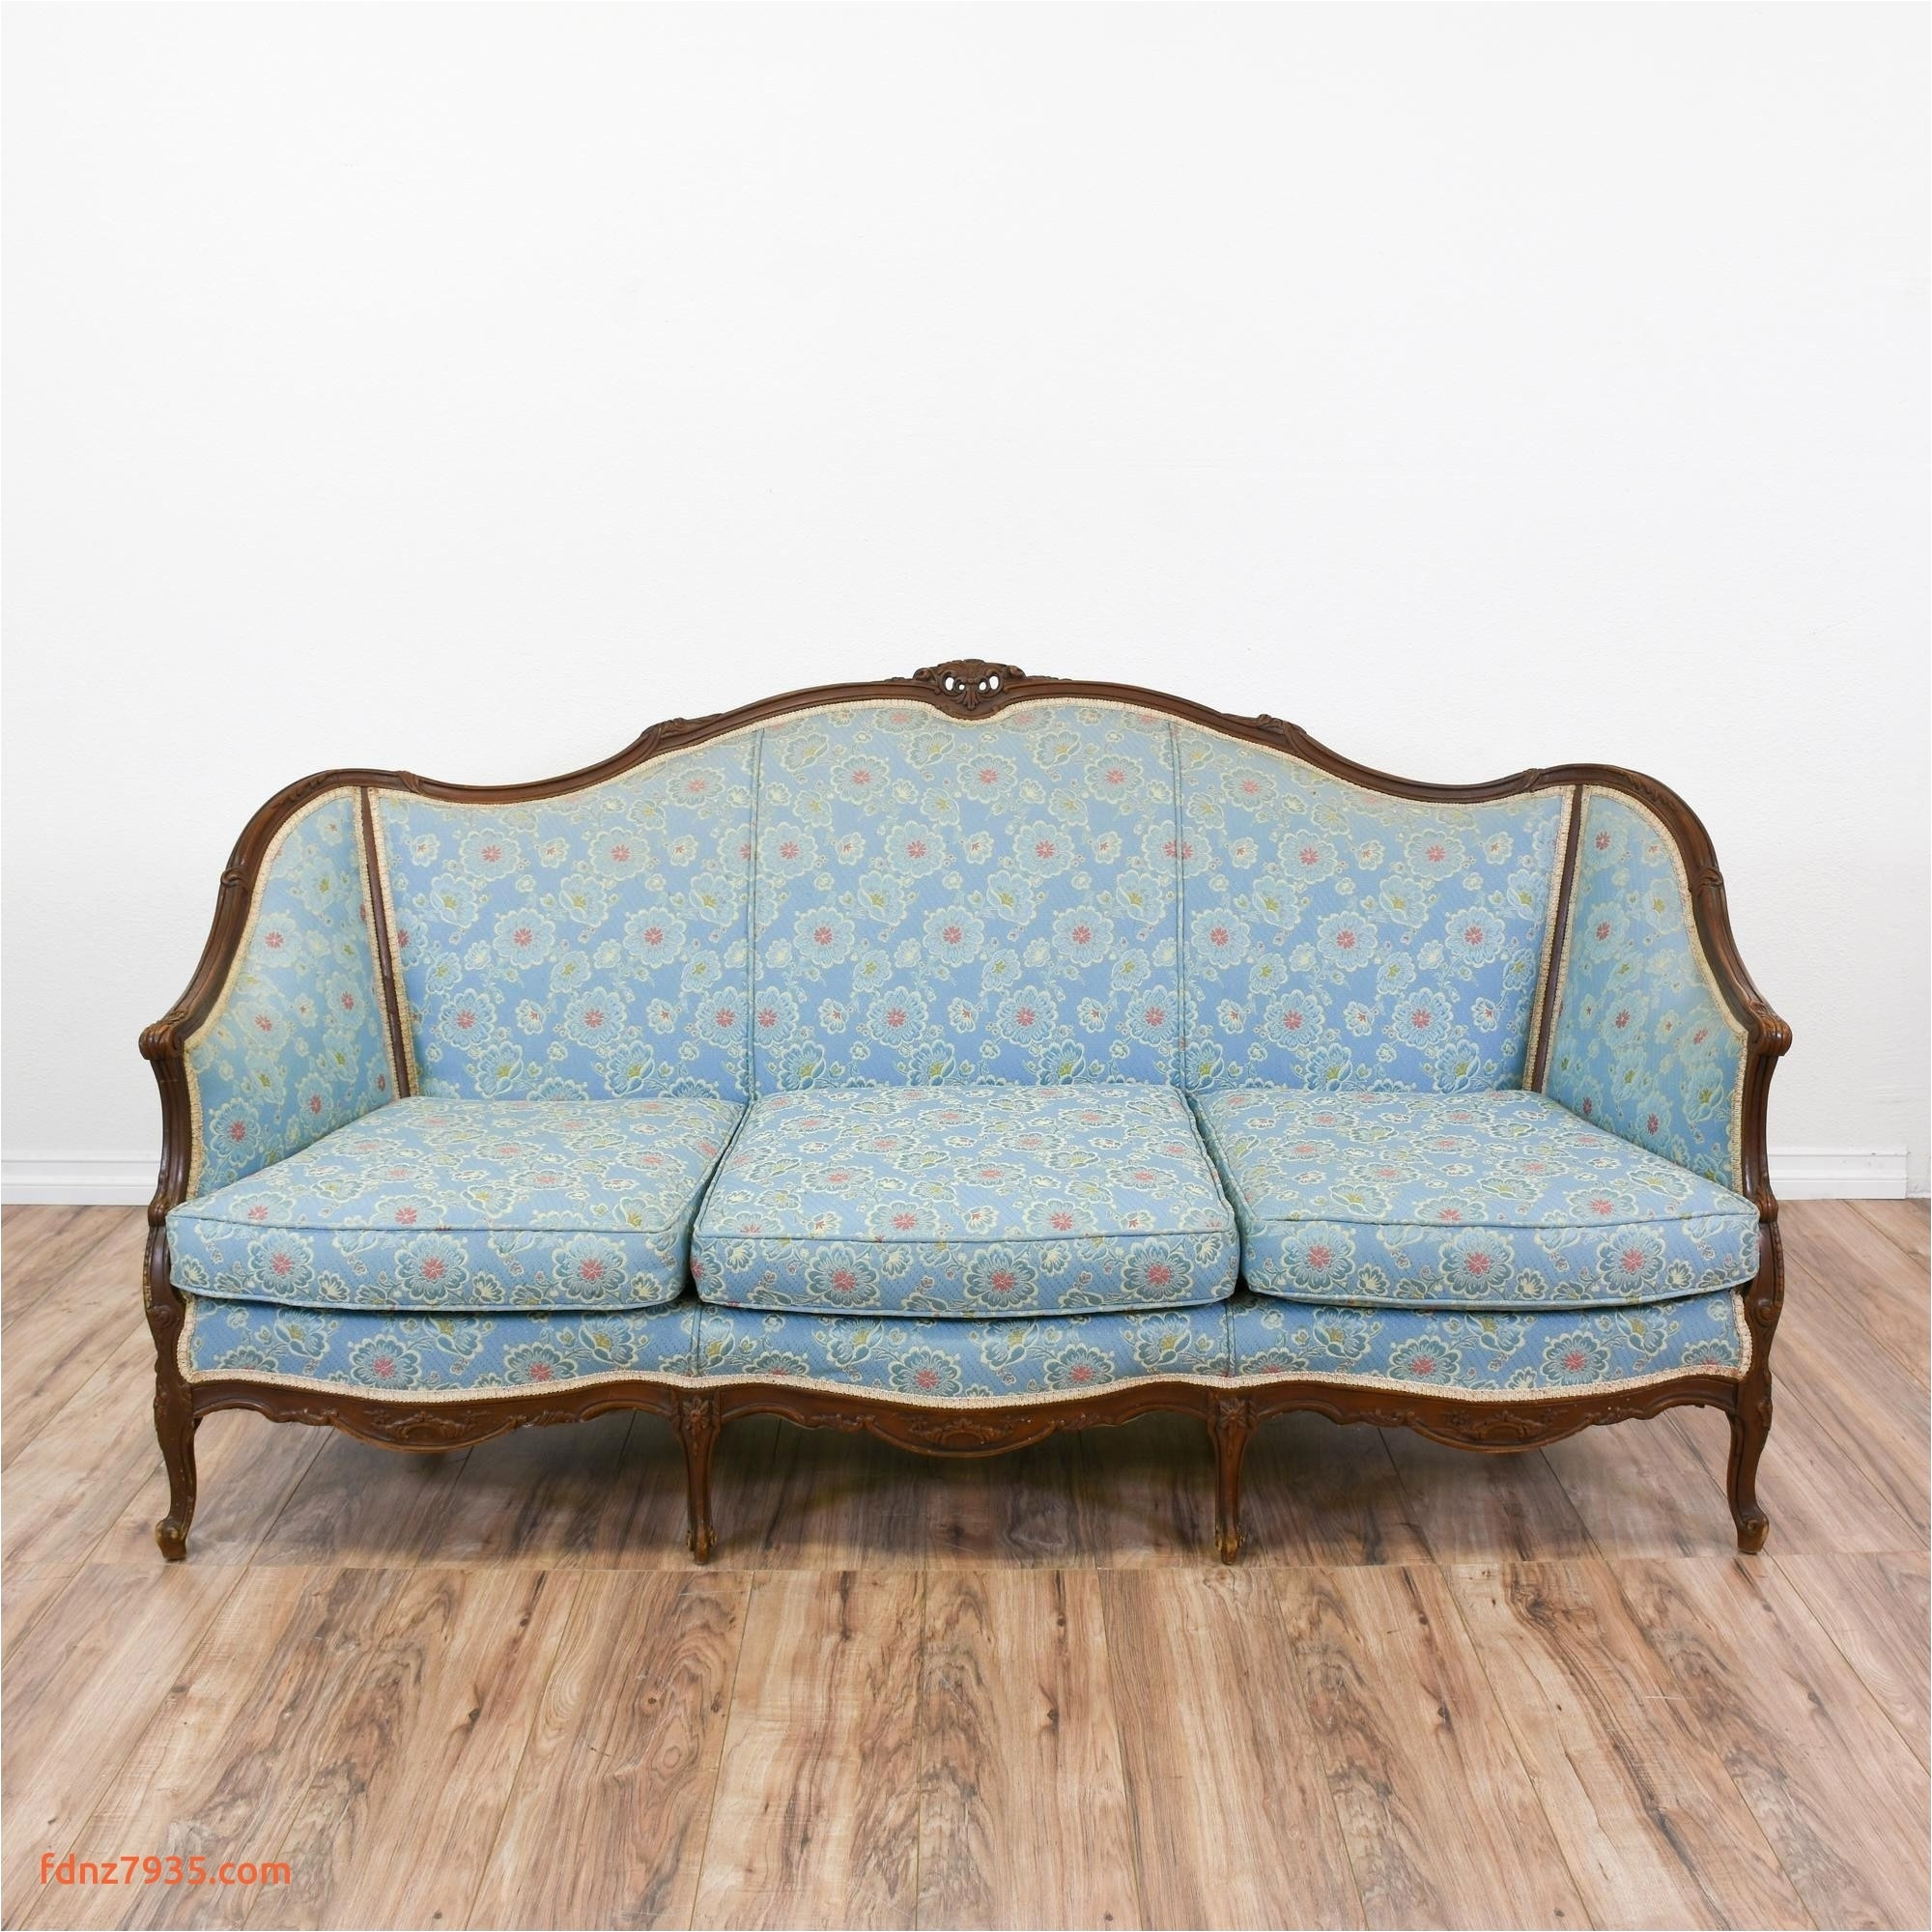 black rattan outdoor furniture nz best wicker outdoor sofa 0d ideas outdoor furniture seat